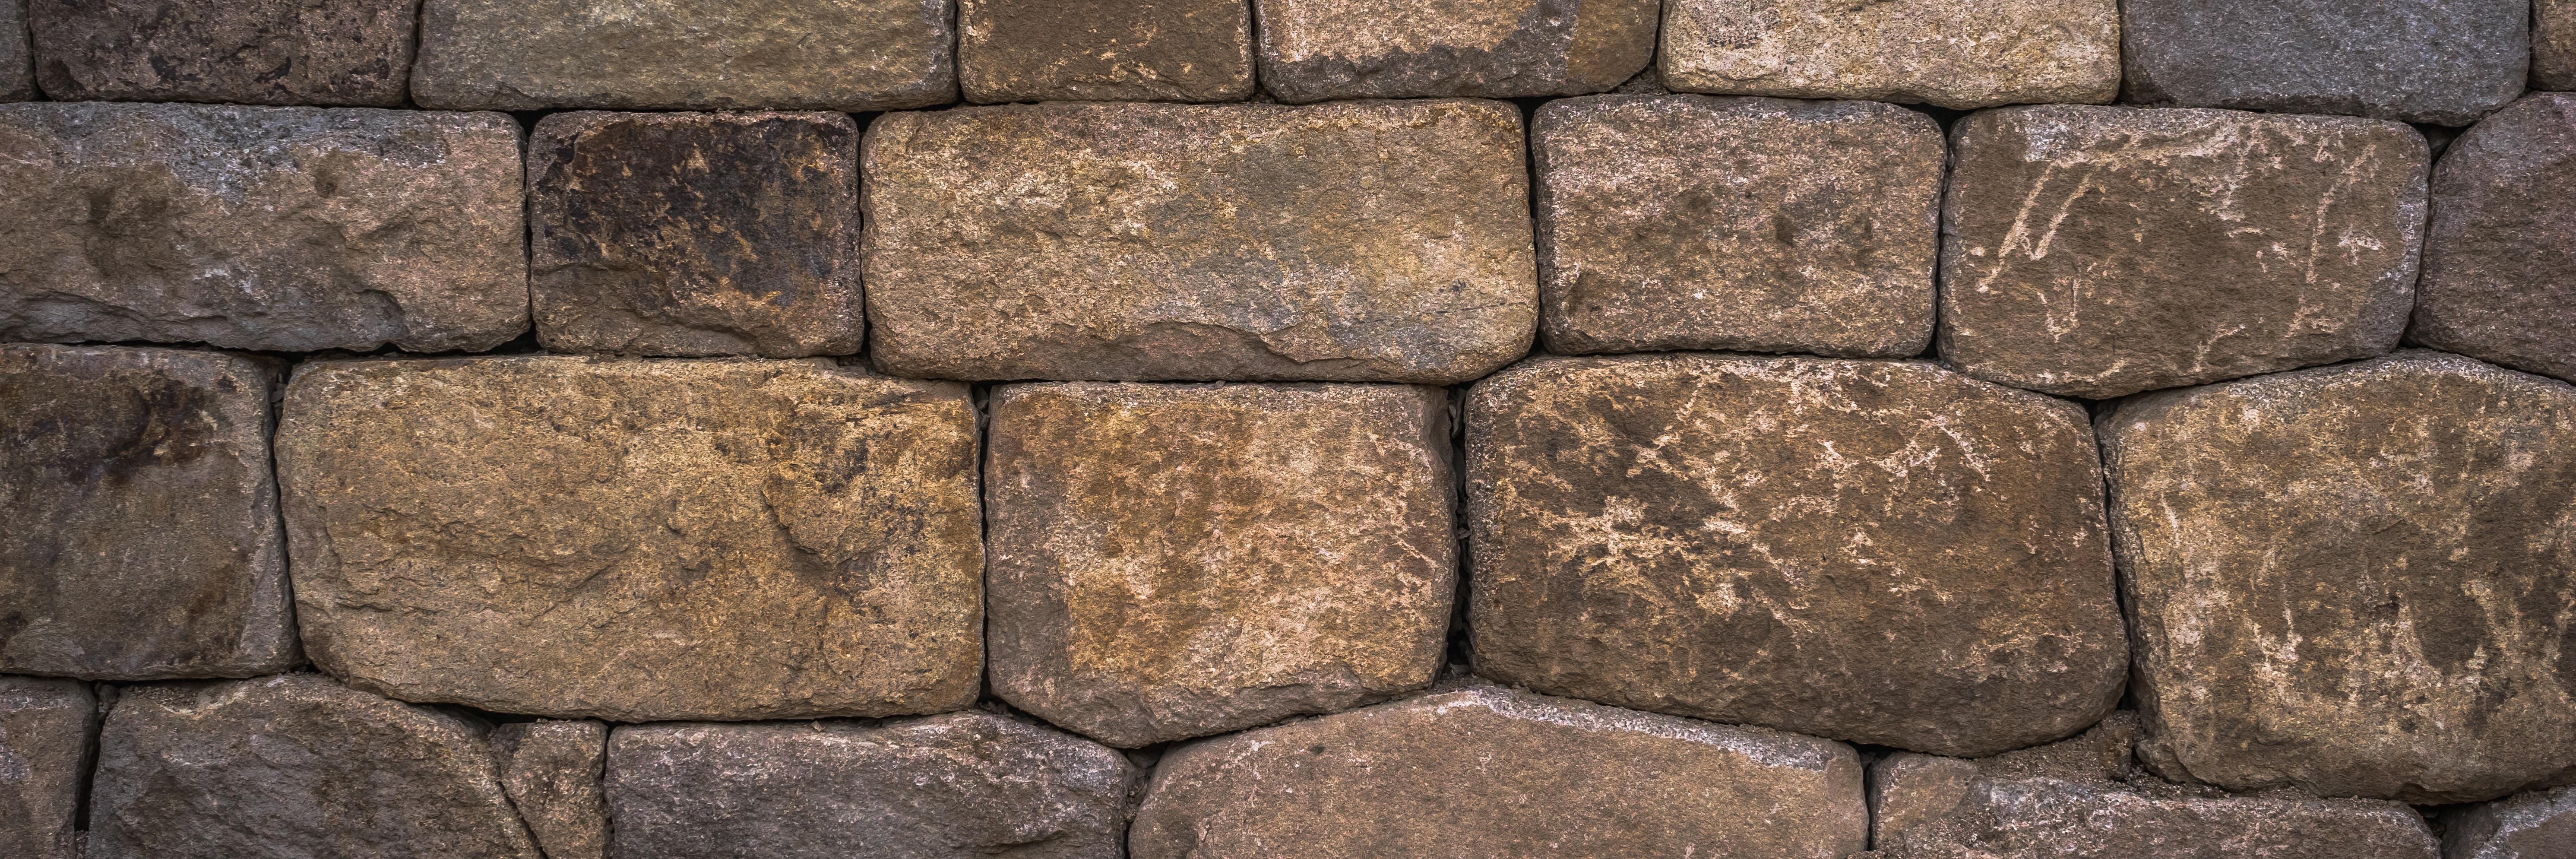 wall stone style quartz n pin pinterest veneer walls and interior bradford stoned j